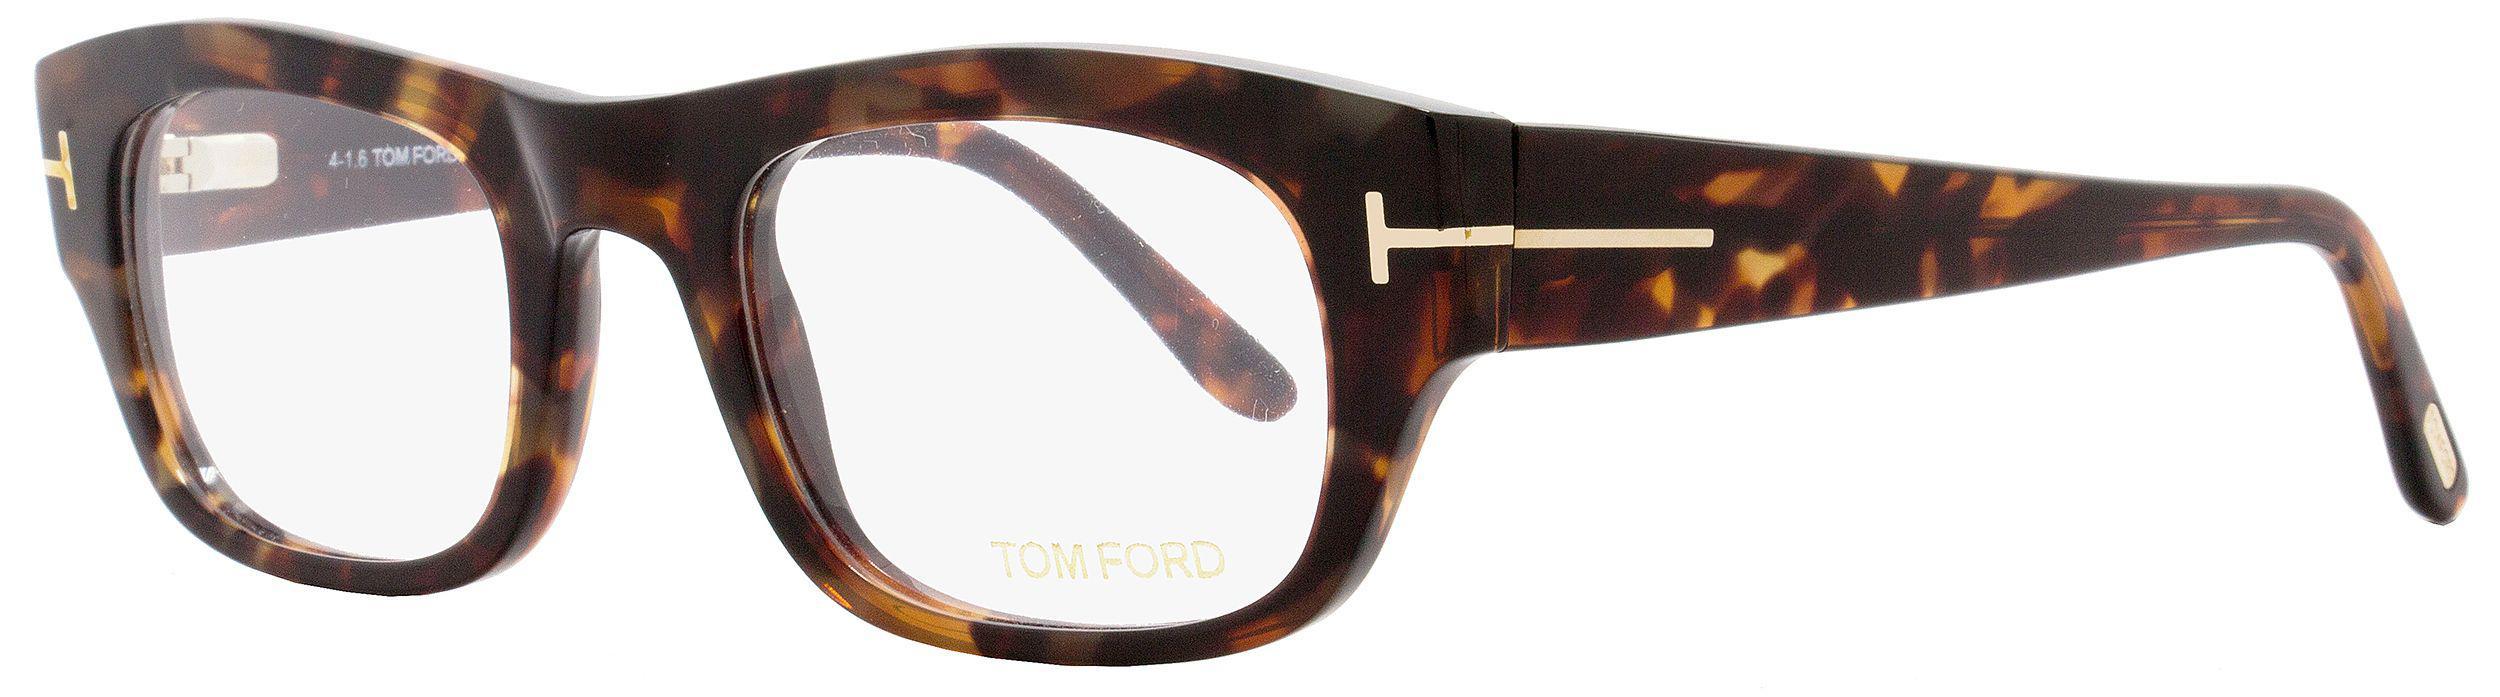 503b4970257 Lyst - Tom Ford Rectangular Eyeglasses Tf5415 054 Size  50mm Red ...